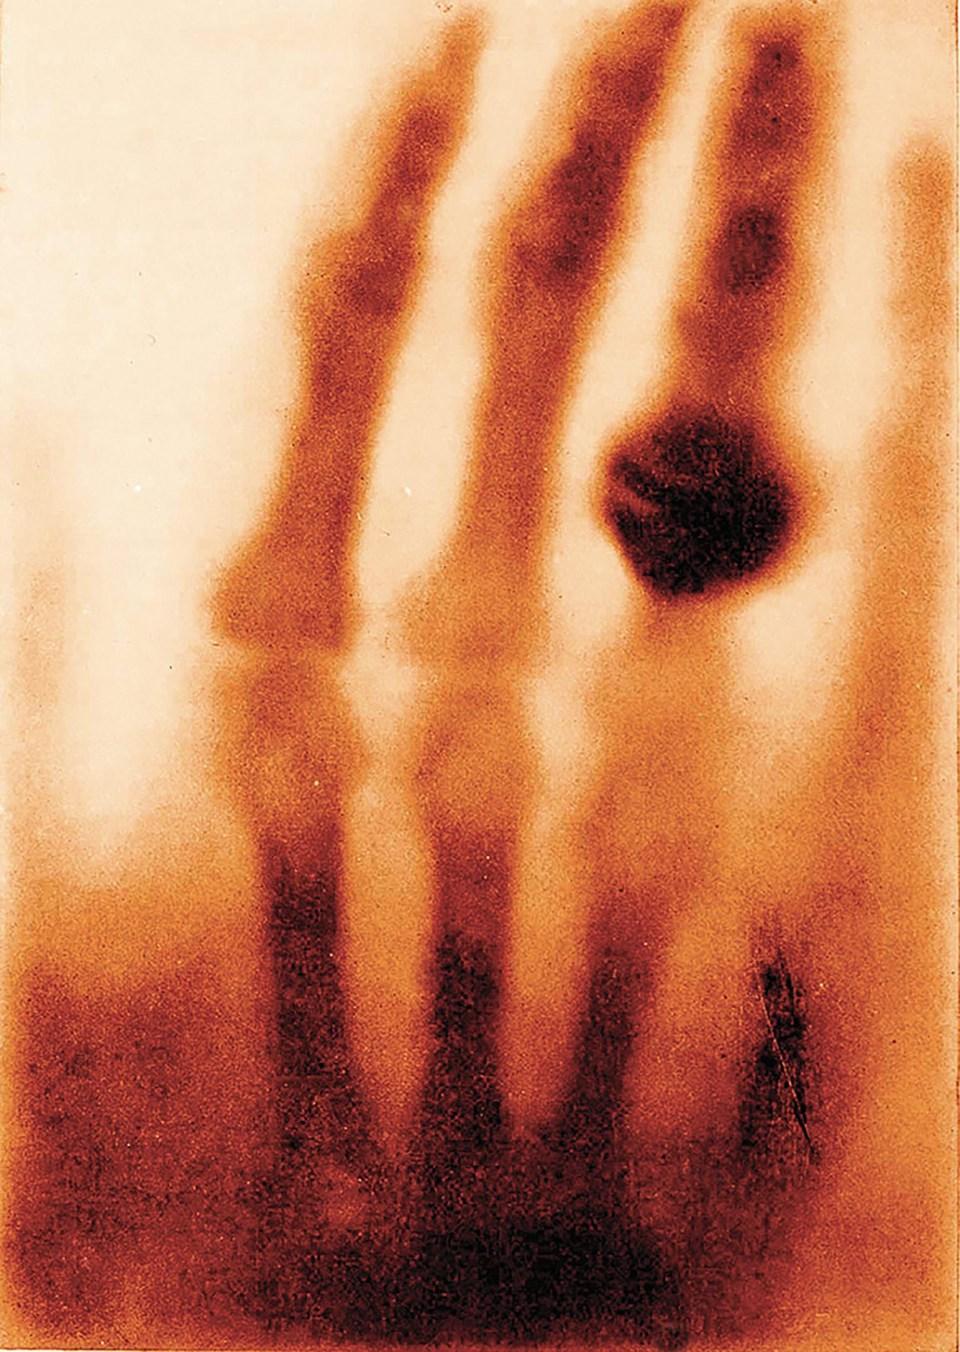 """La mano de la Sra. Wilhelm Röntgen"" (Wilhelm Conrad Röntgen, Alemania, 1895)"